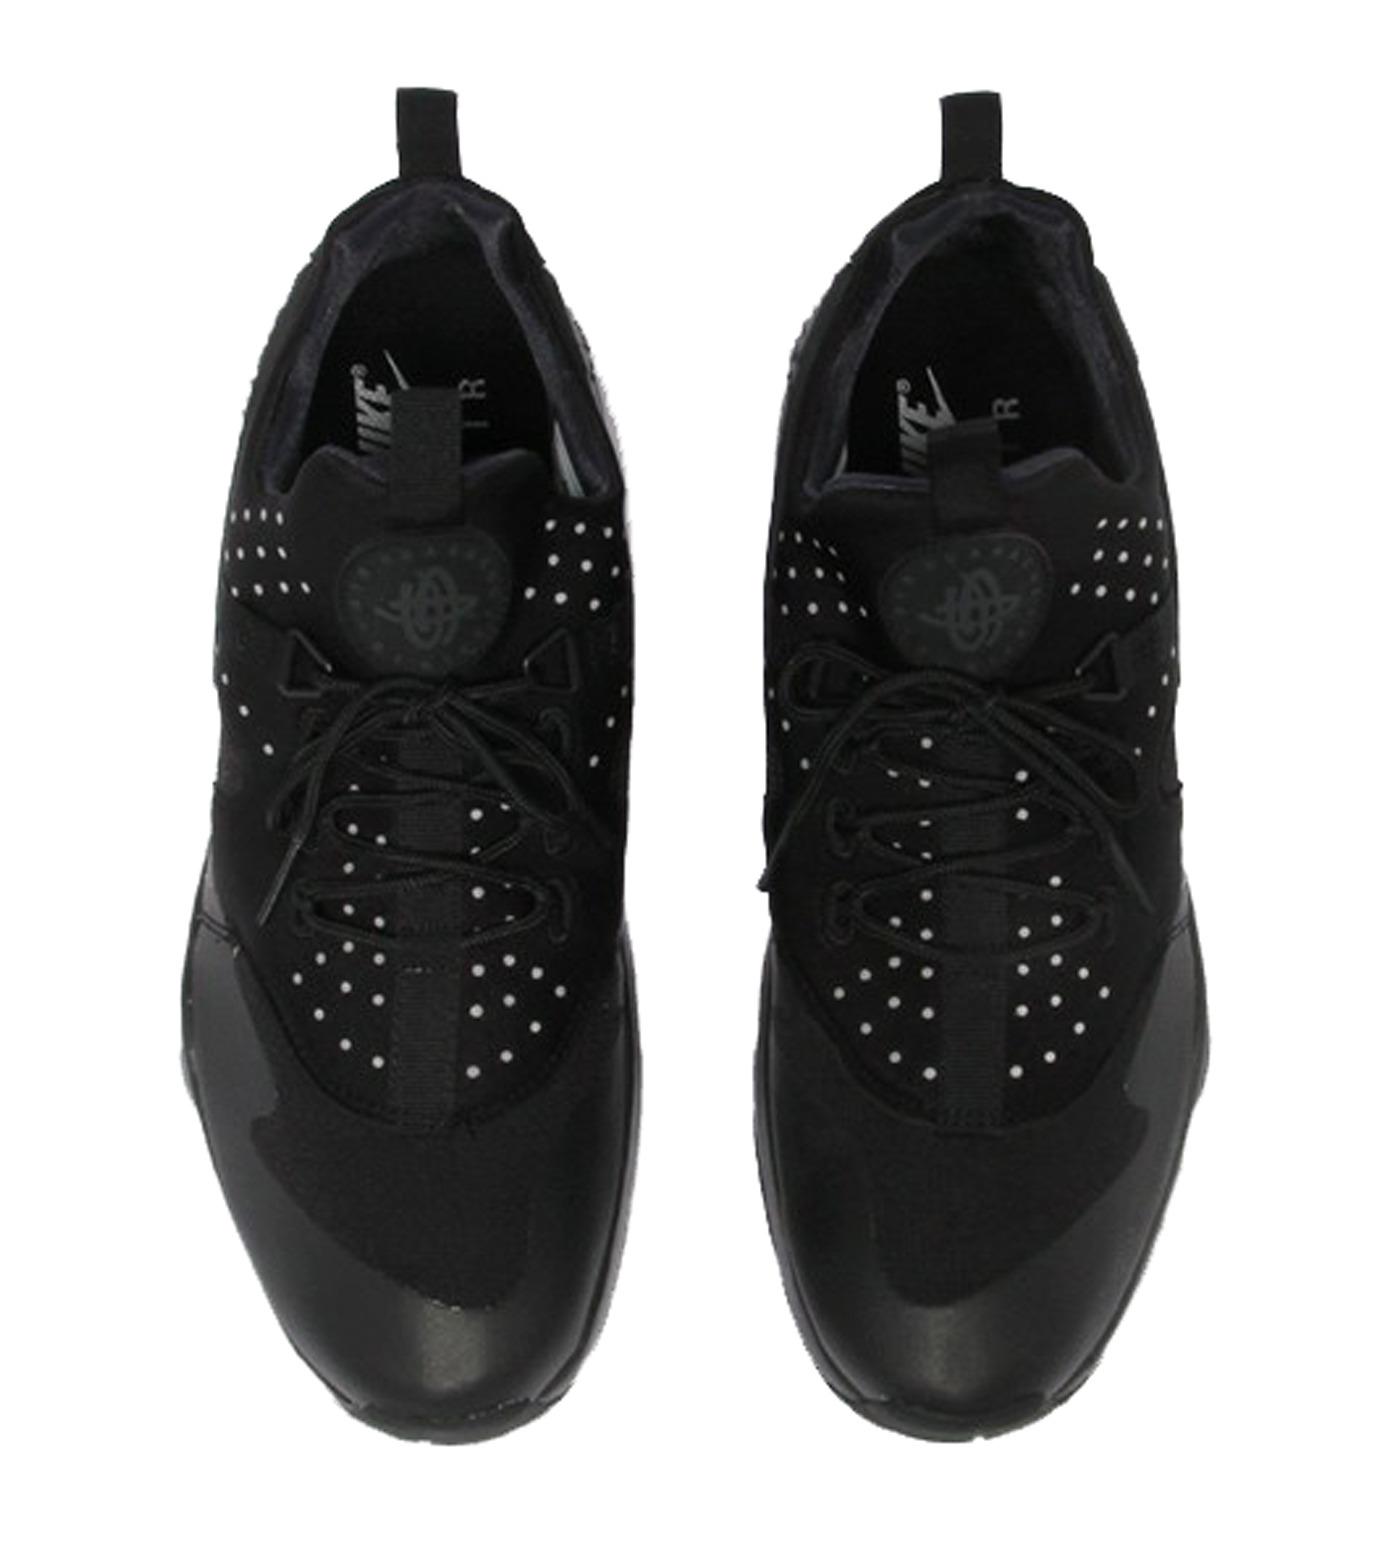 NIKE(ナイキ)のAIR HUARACHE 2/3-BLACK(シューズ/shoes)-806807-002-13 拡大詳細画像4